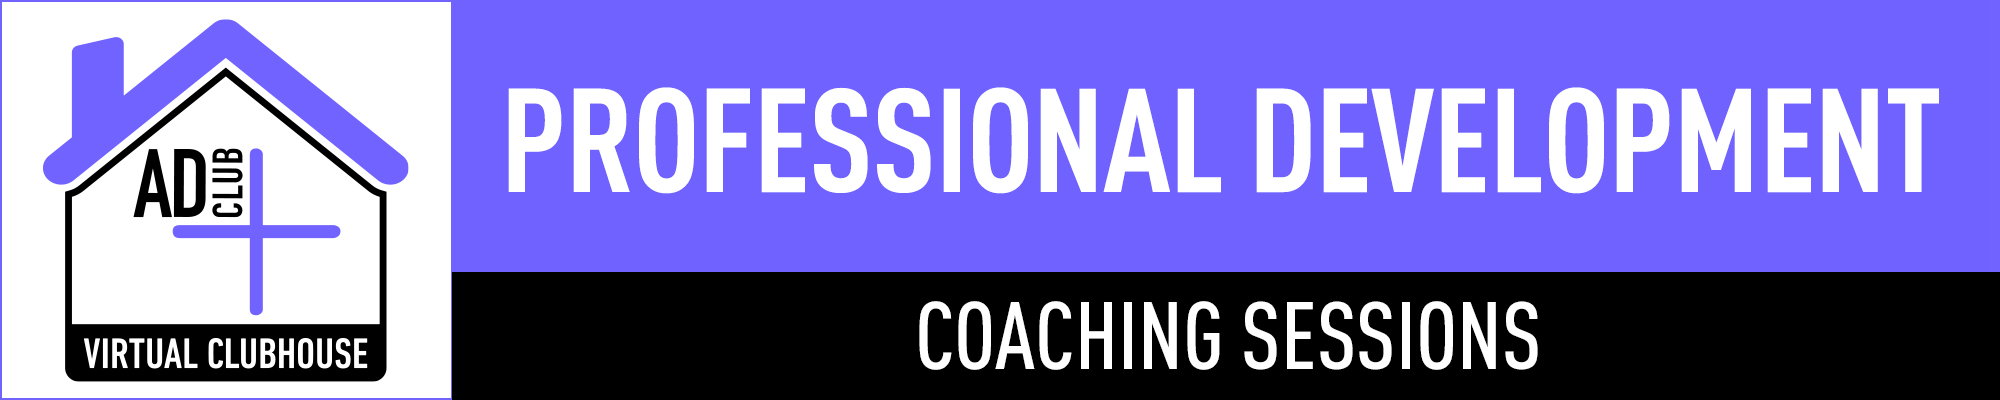 2000x400_PD_CoachingSessions